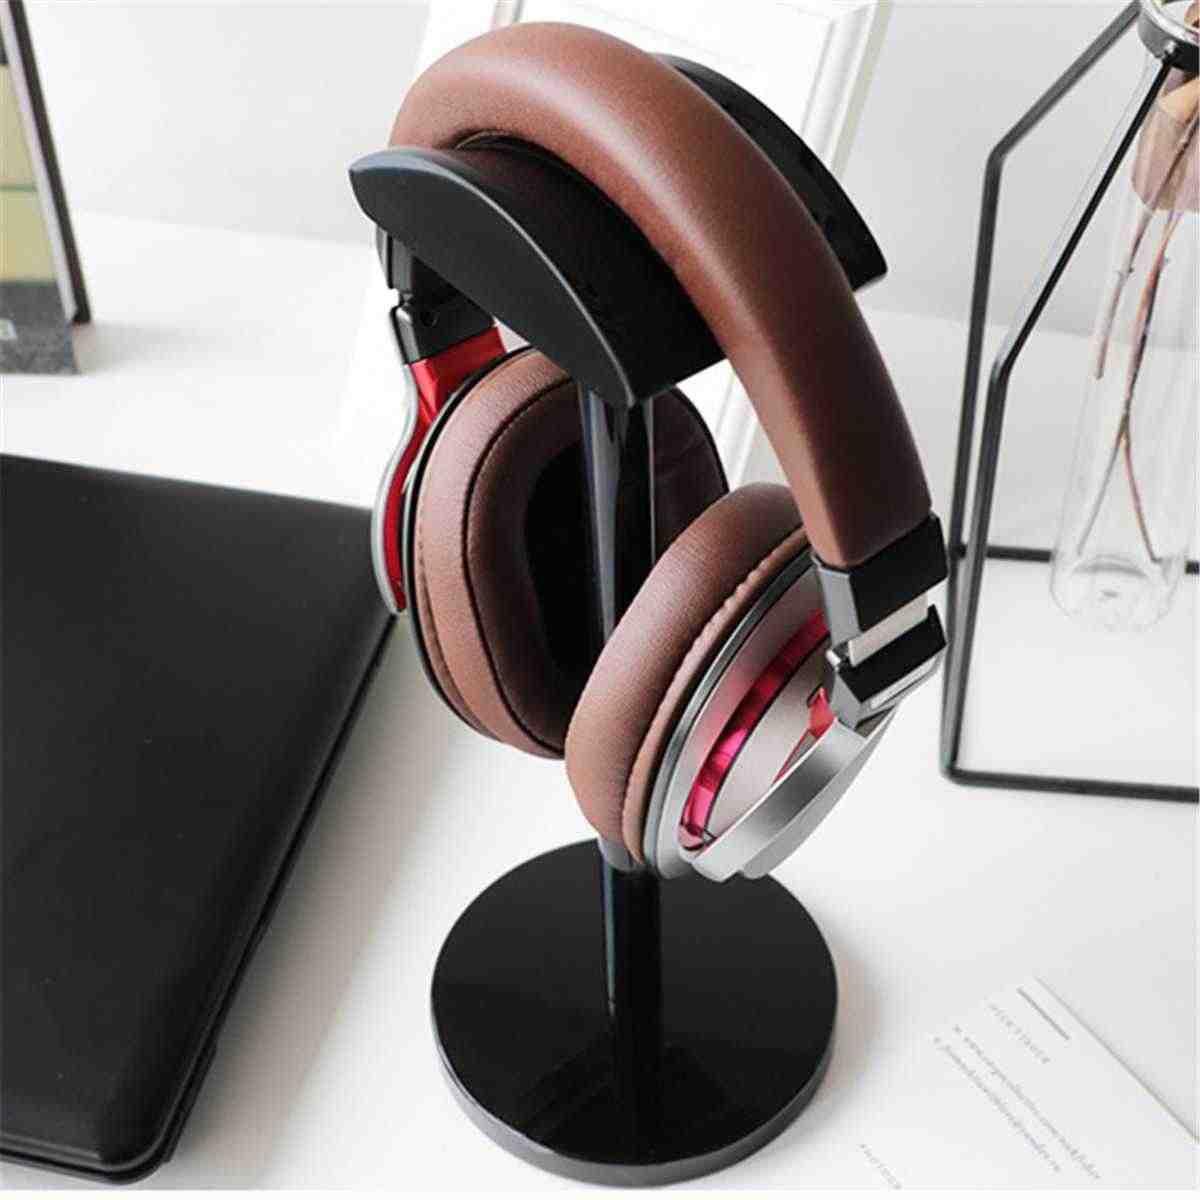 Acrylic Headphone Earphone Headset Stand Hanger Bracket Desk Display Shelf Rack Organizer Earphone Accessories 2 Colors